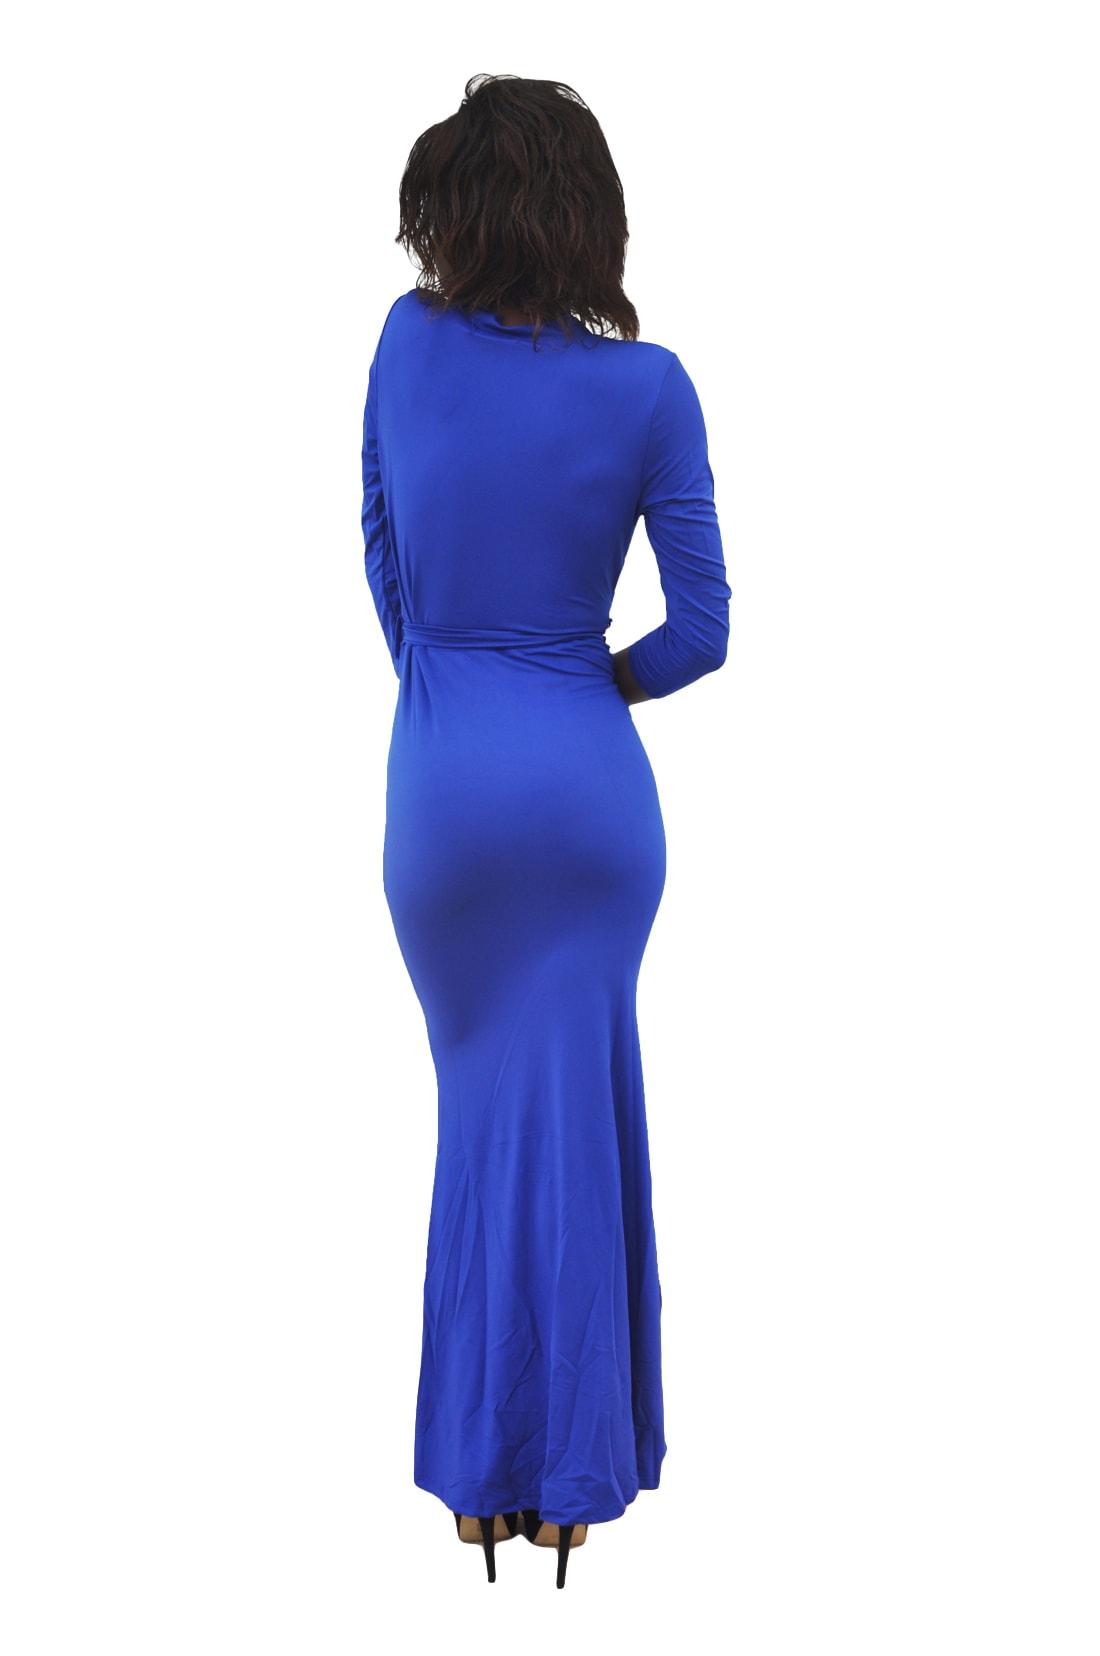 M0230 blue3 Long Sleeve Dresses maureens.com boutique